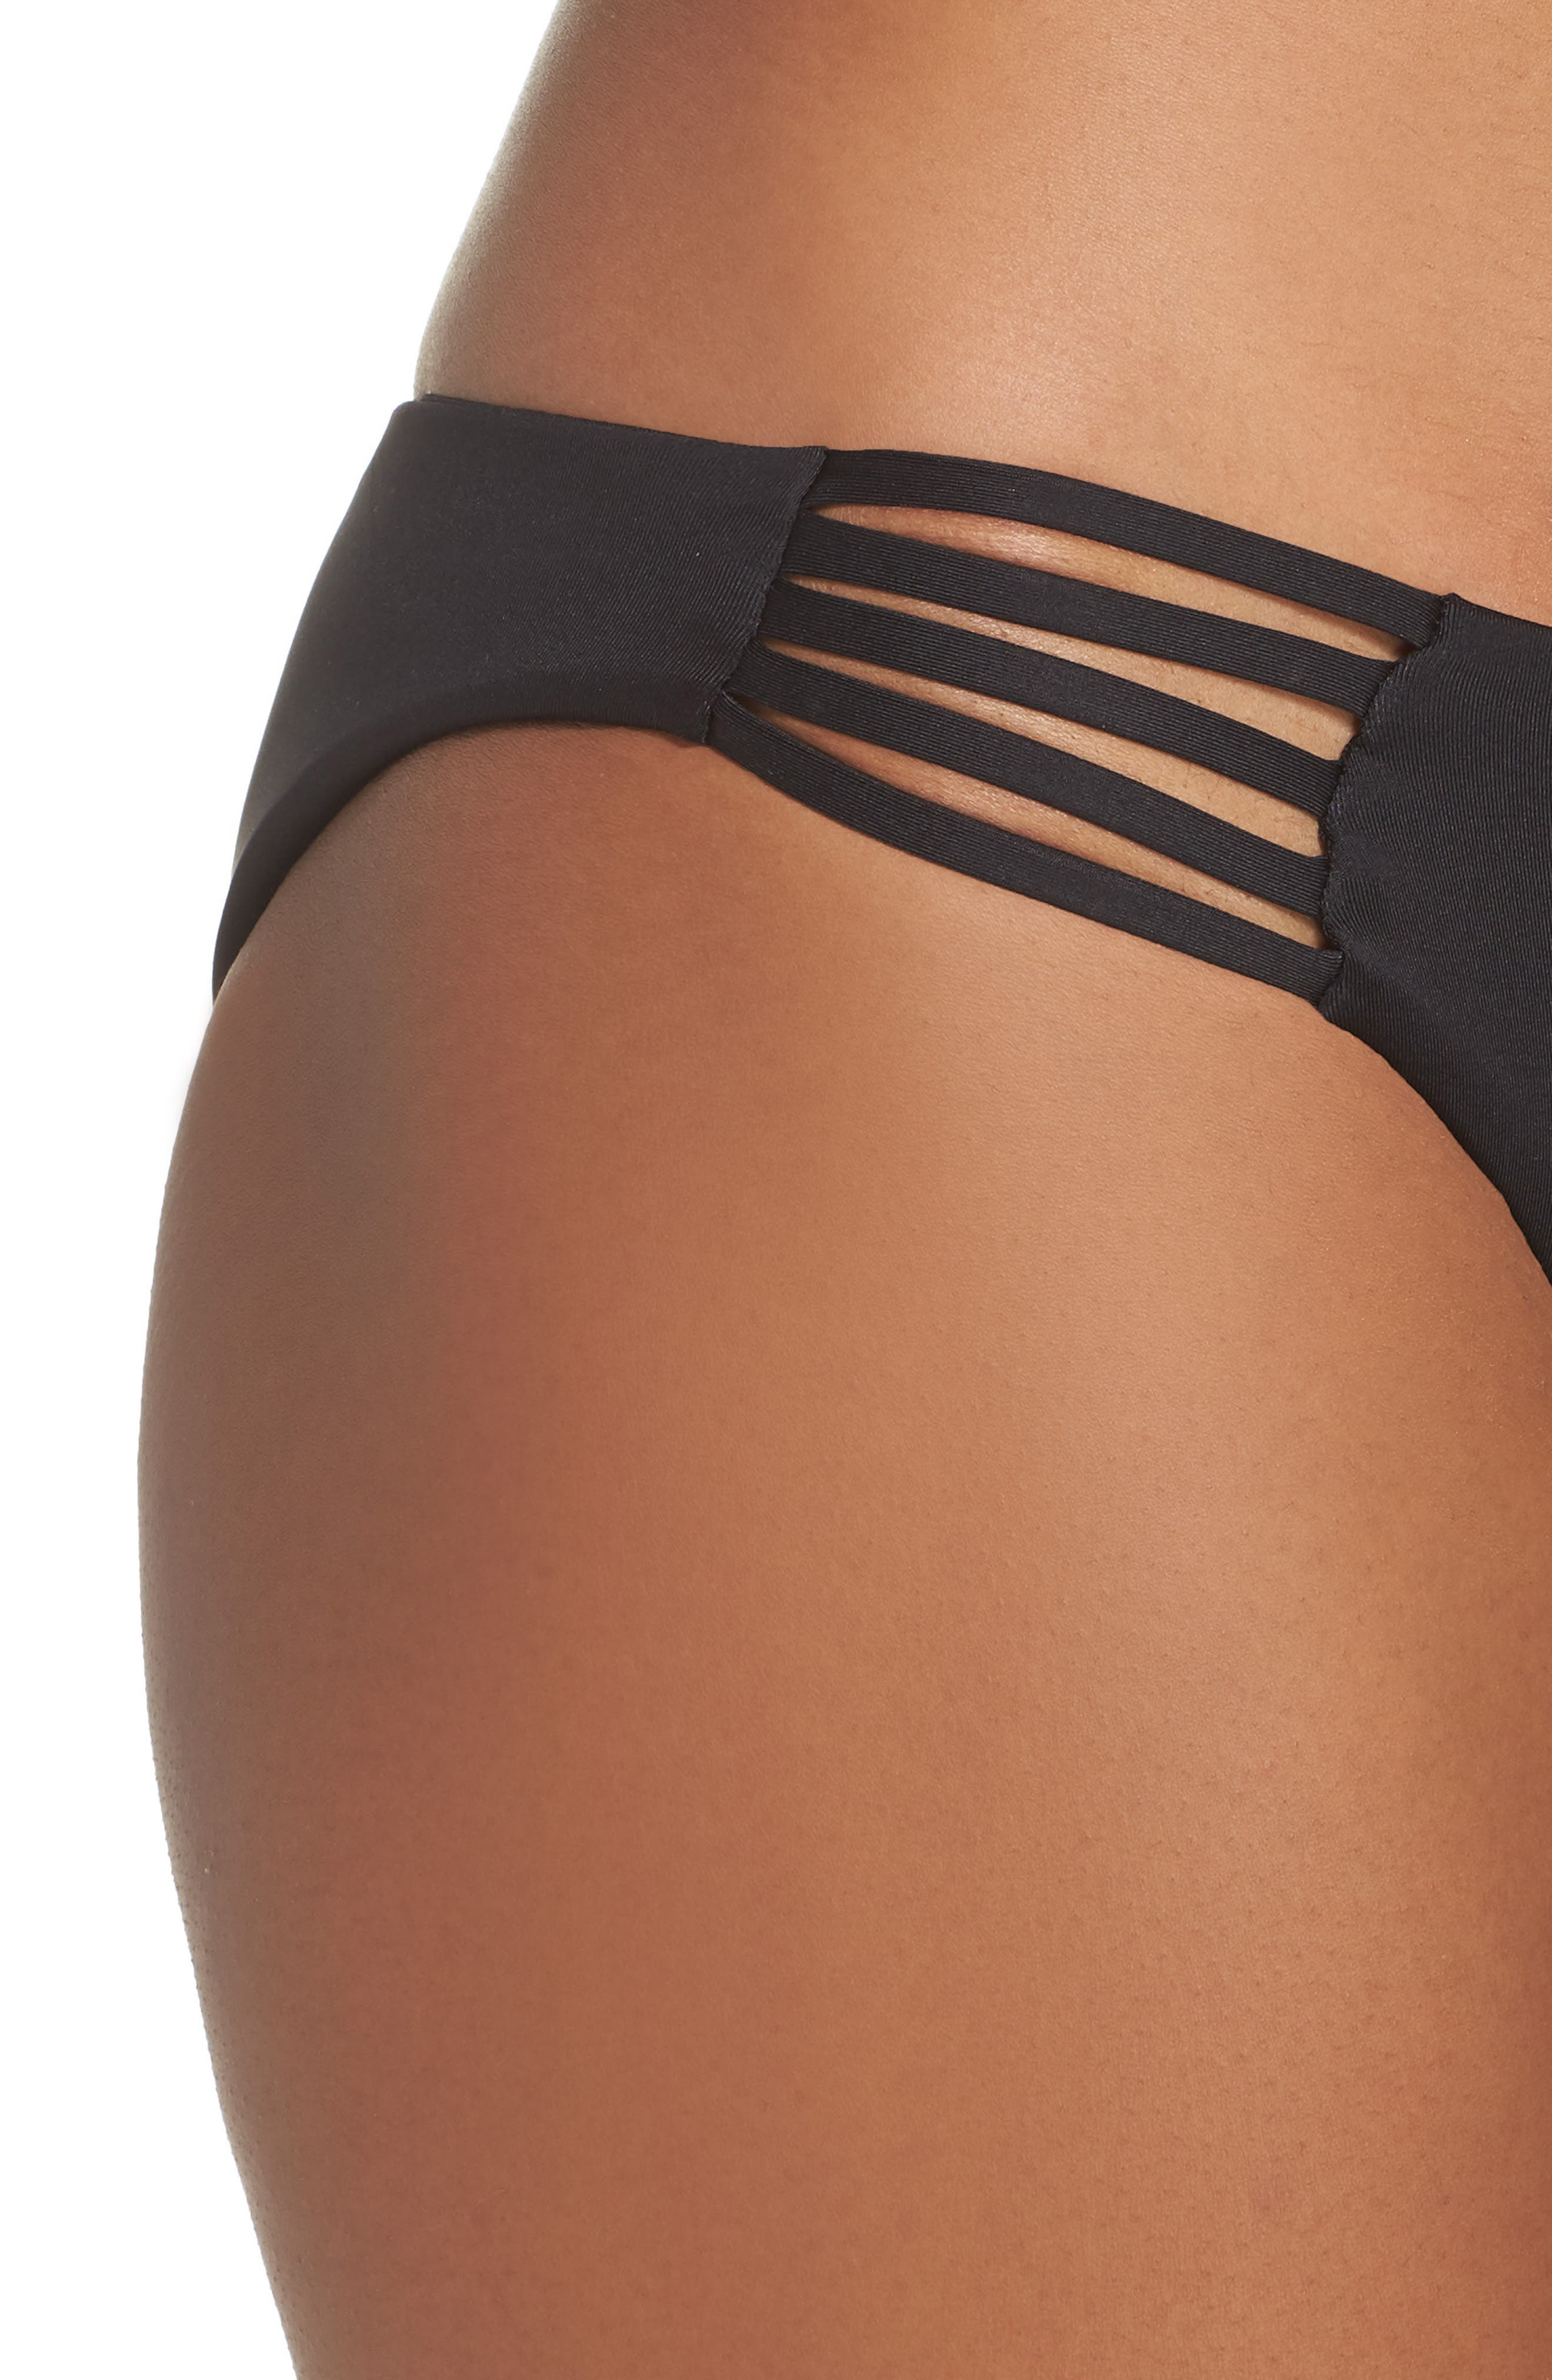 Seaglass Bay Reversible Bikini Bottoms,                             Alternate thumbnail 4, color,                             BLACK